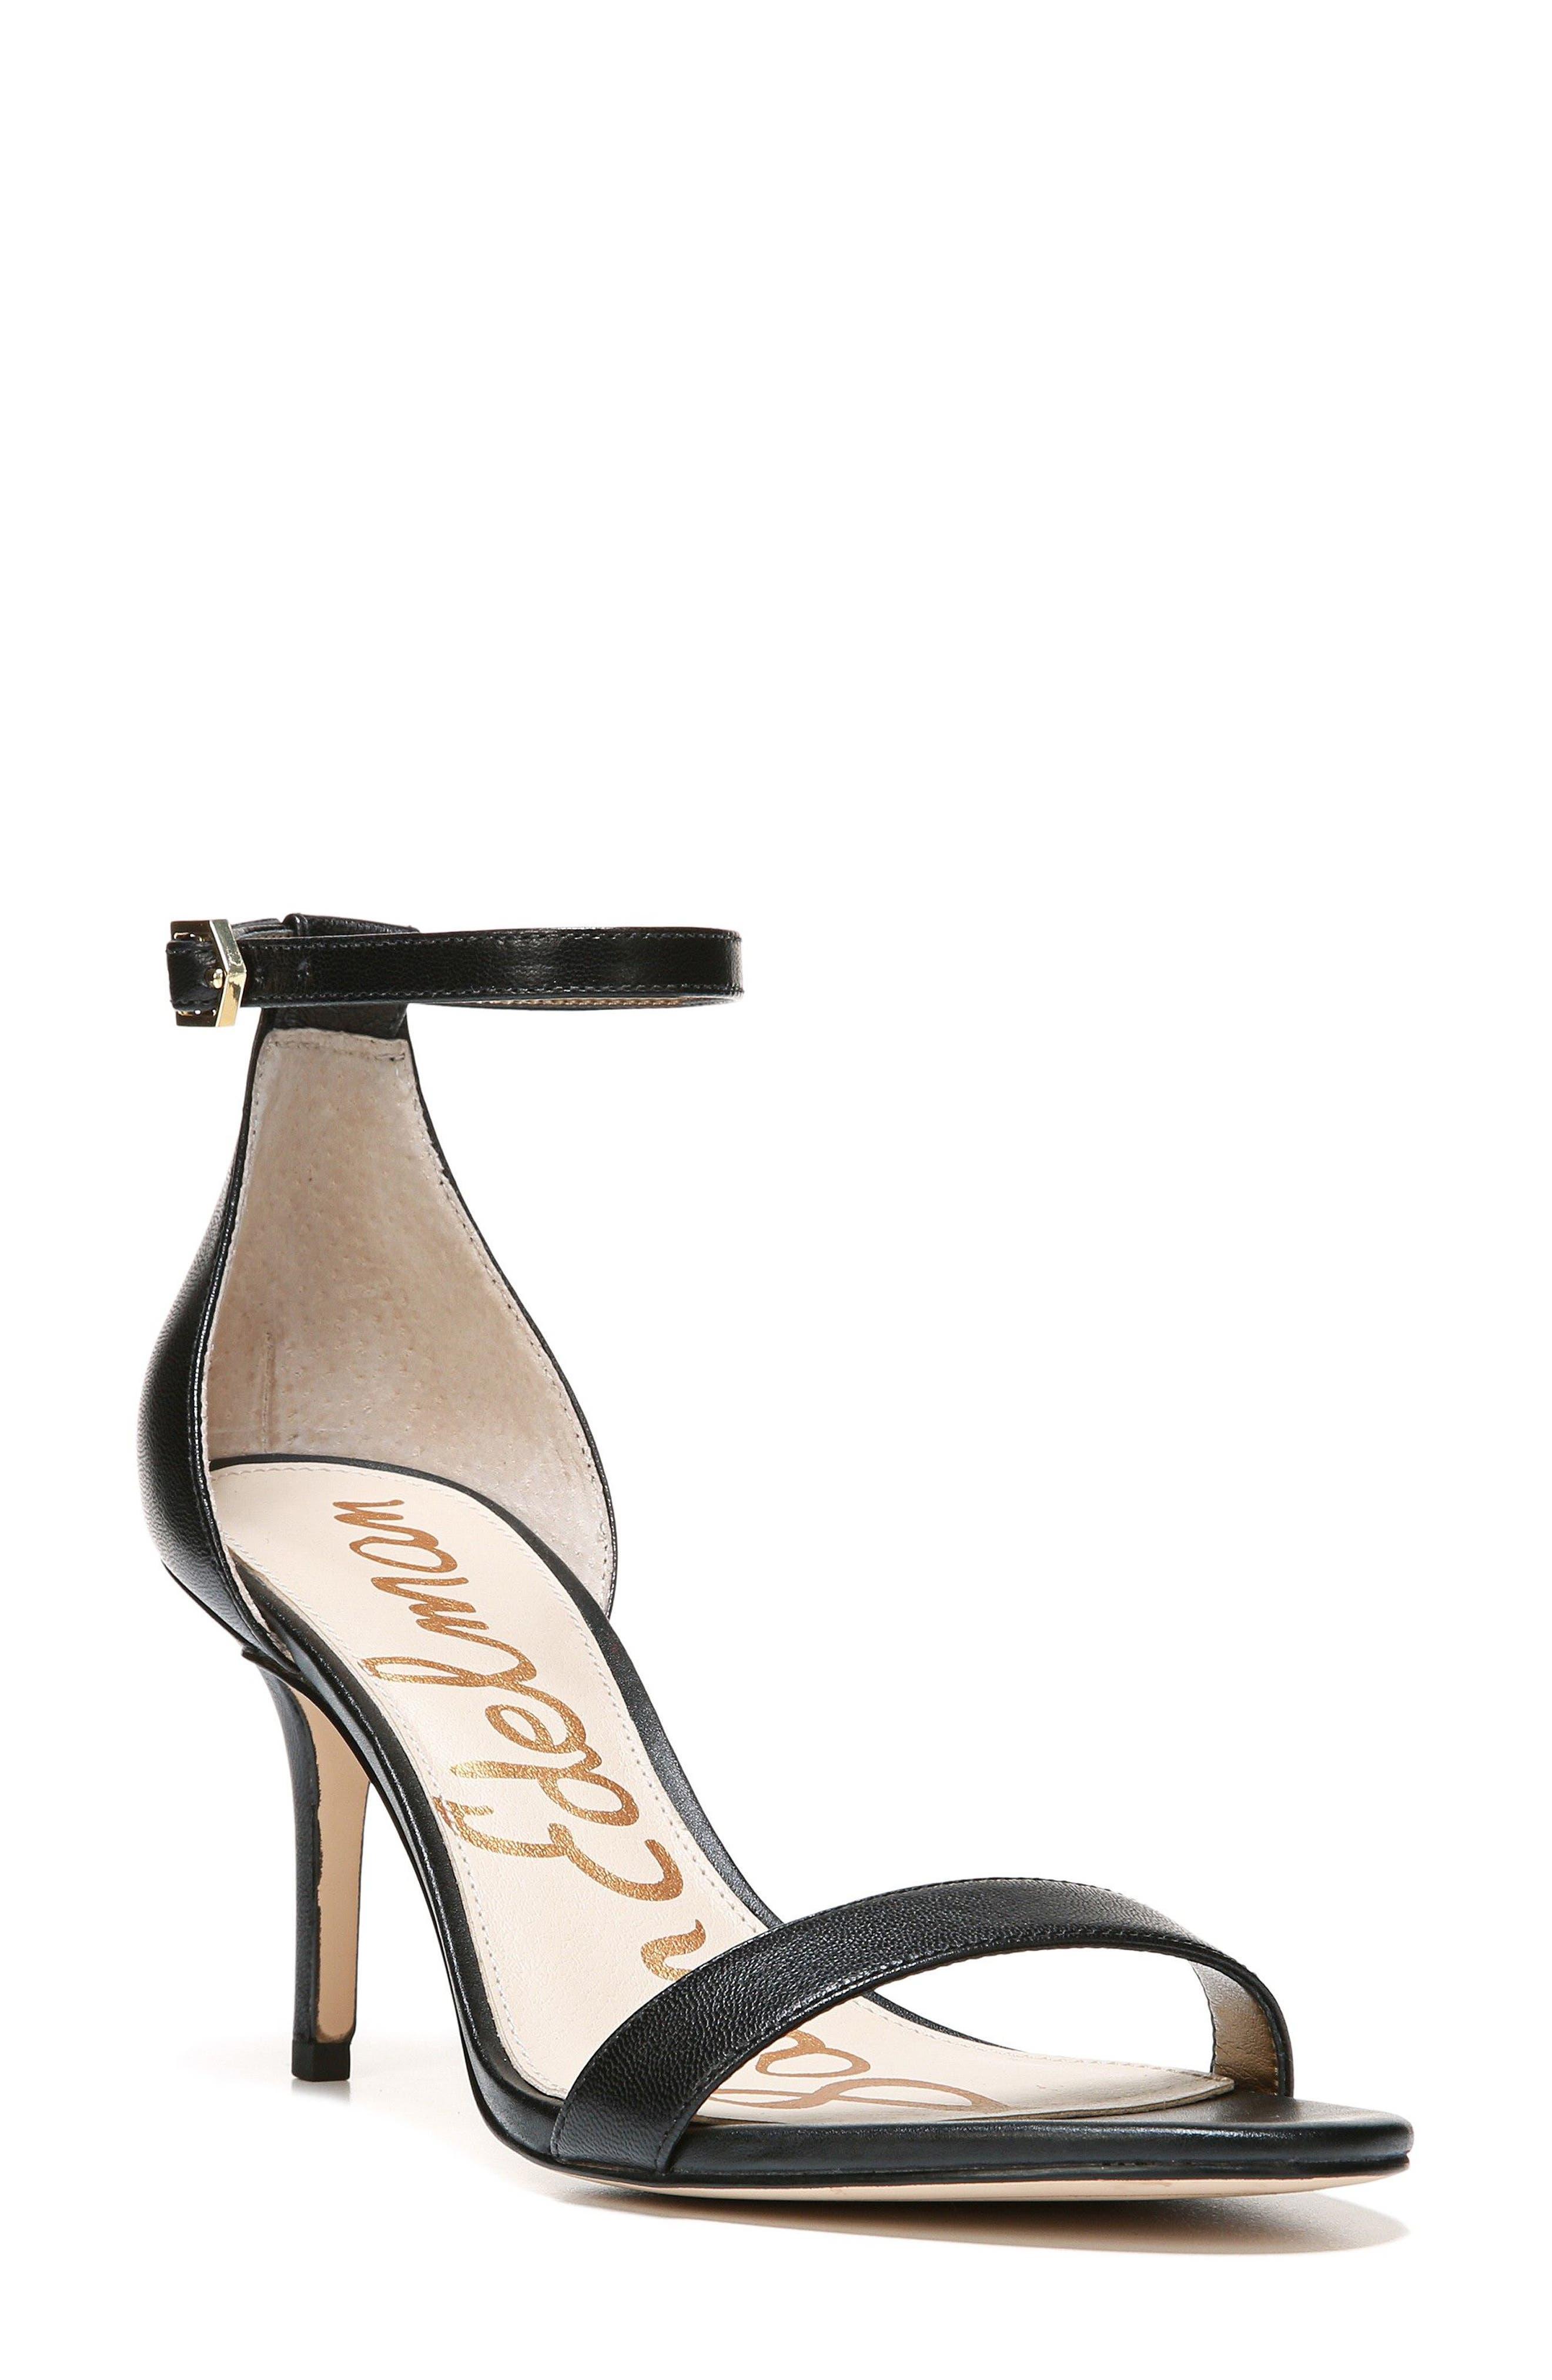 Sam Edelman Ankle Ankle Ankle Strap Sandales for Damens   Nordstrom b64623